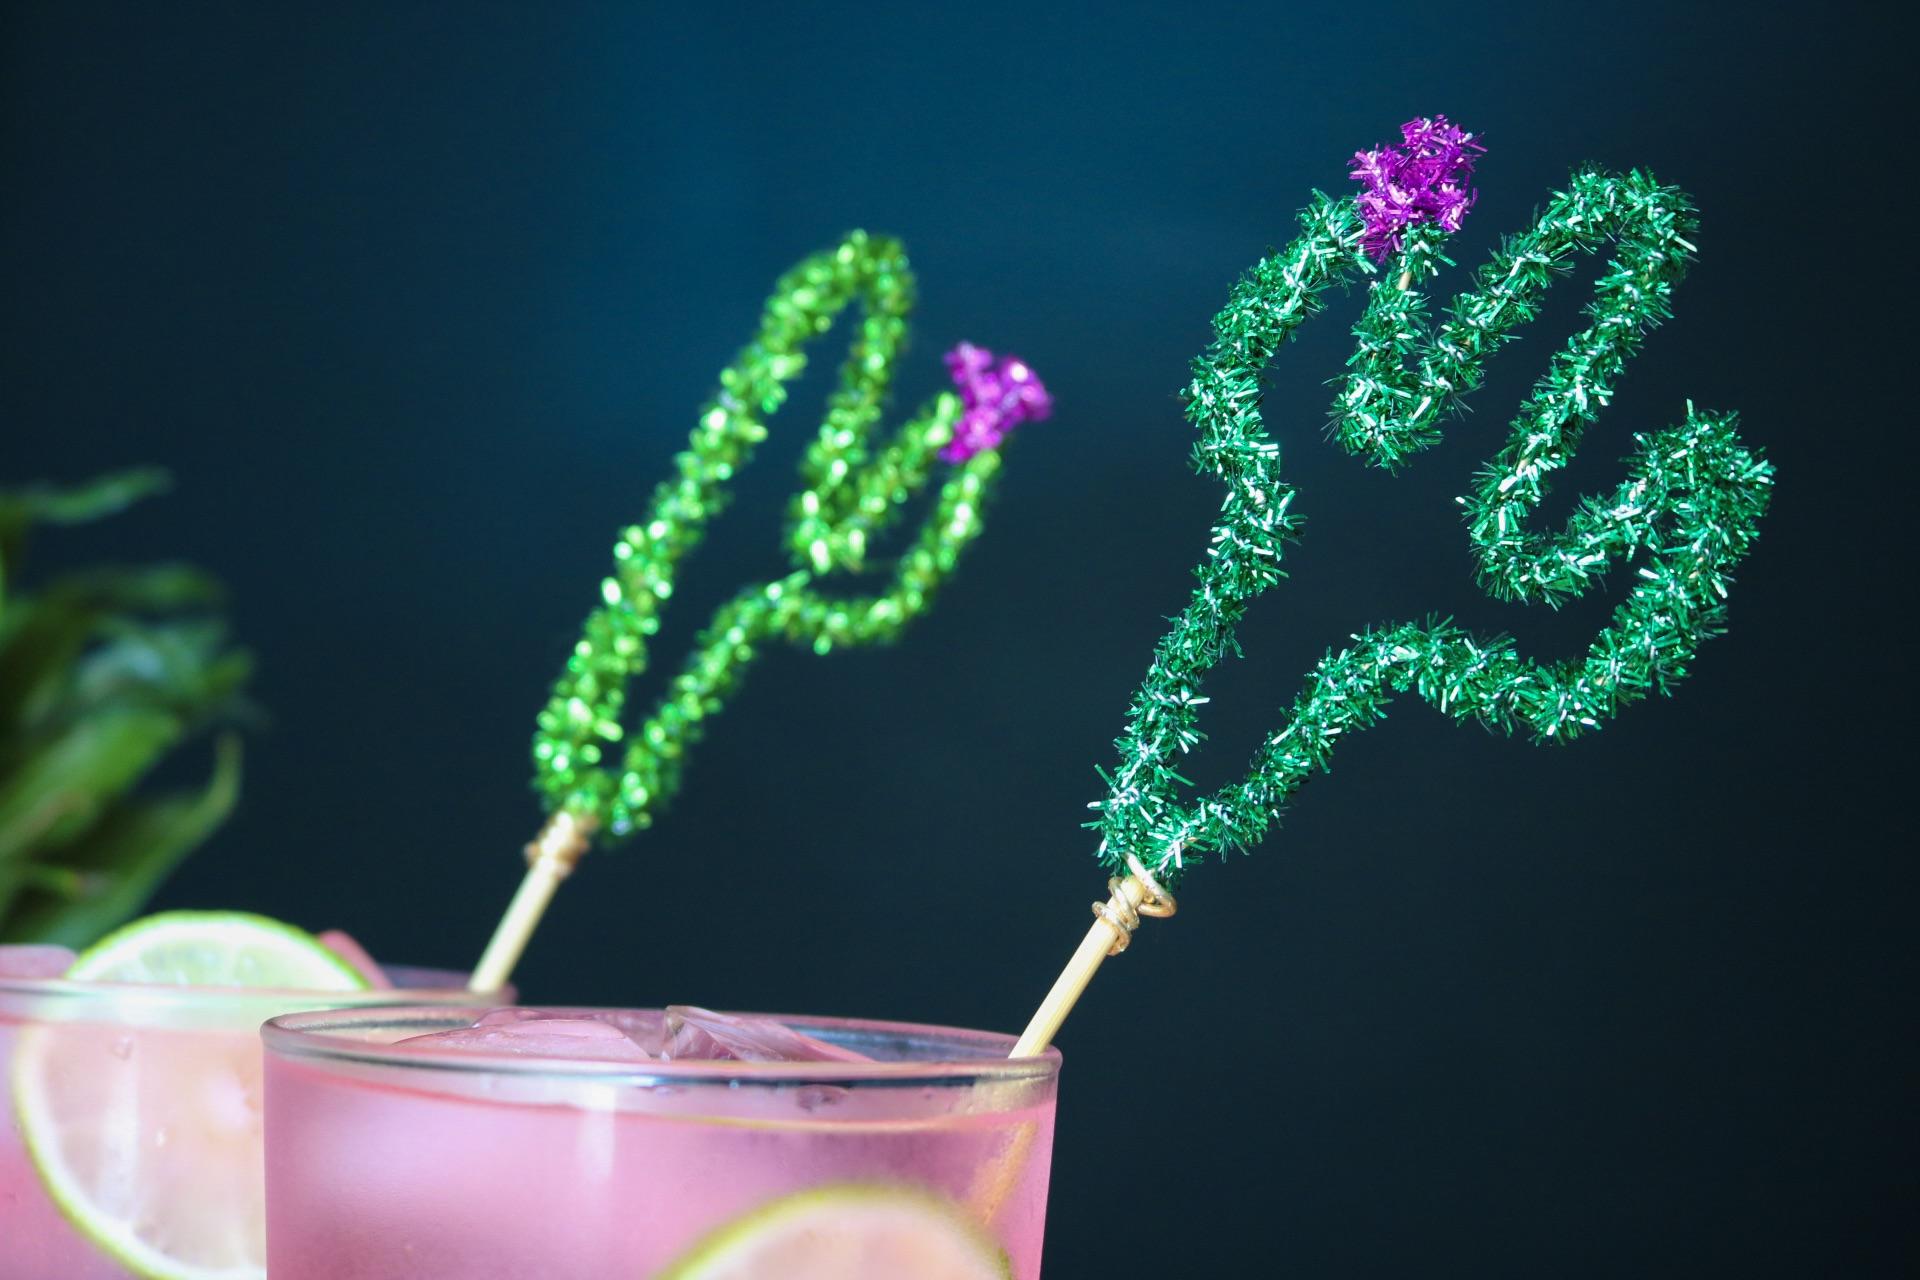 Pipe Cleaner Cactus Cocktail Stirrers #festiveflourish #cocktailrecipes #cocktailstirrers #diypipecleanercraft #cactus #cincodemayo #summerdrinks #summerdiy #summer